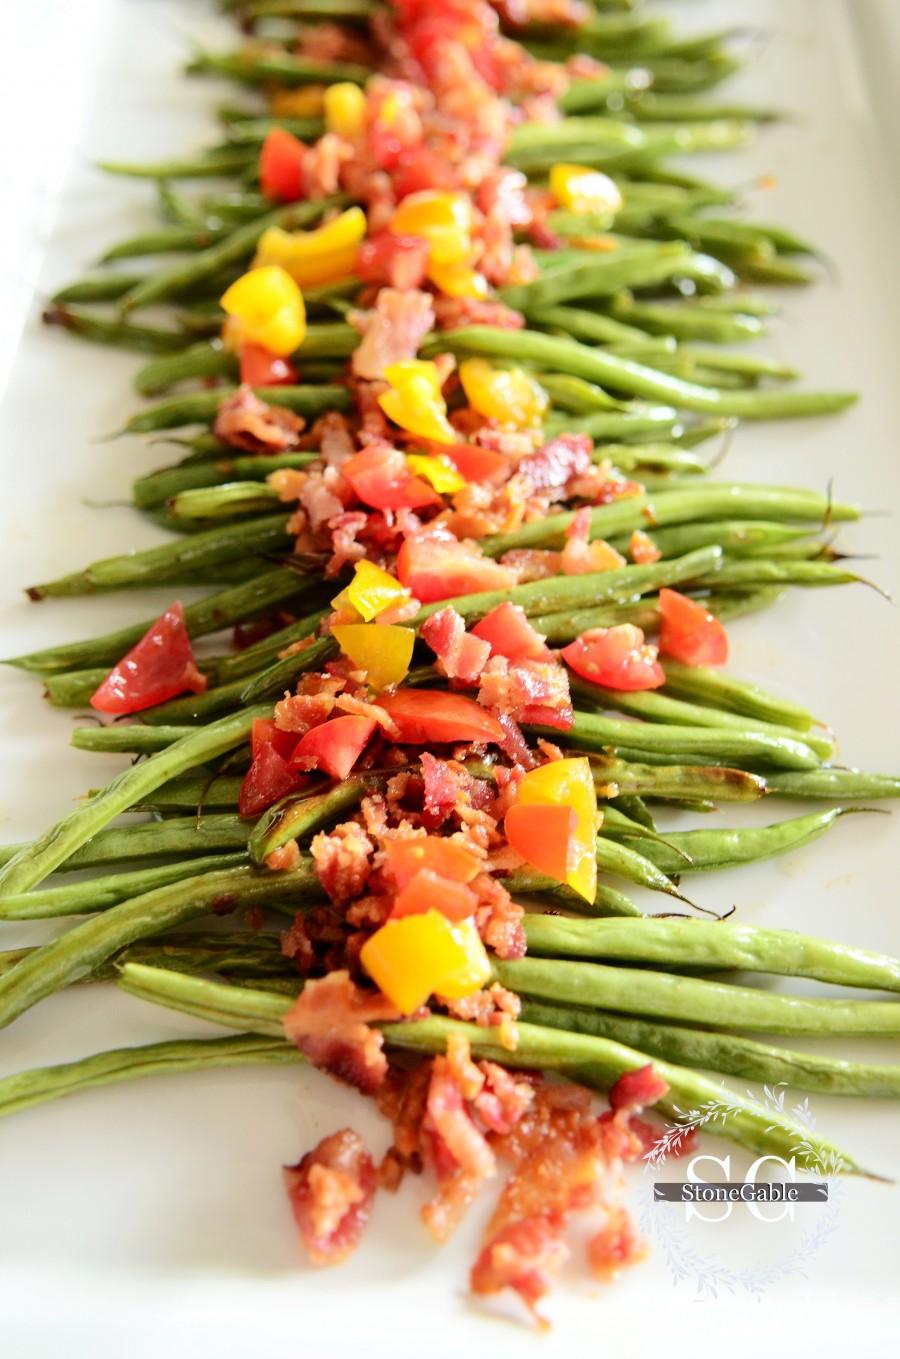 roasted-green-beans-on-a-plate-stonegableblog-com